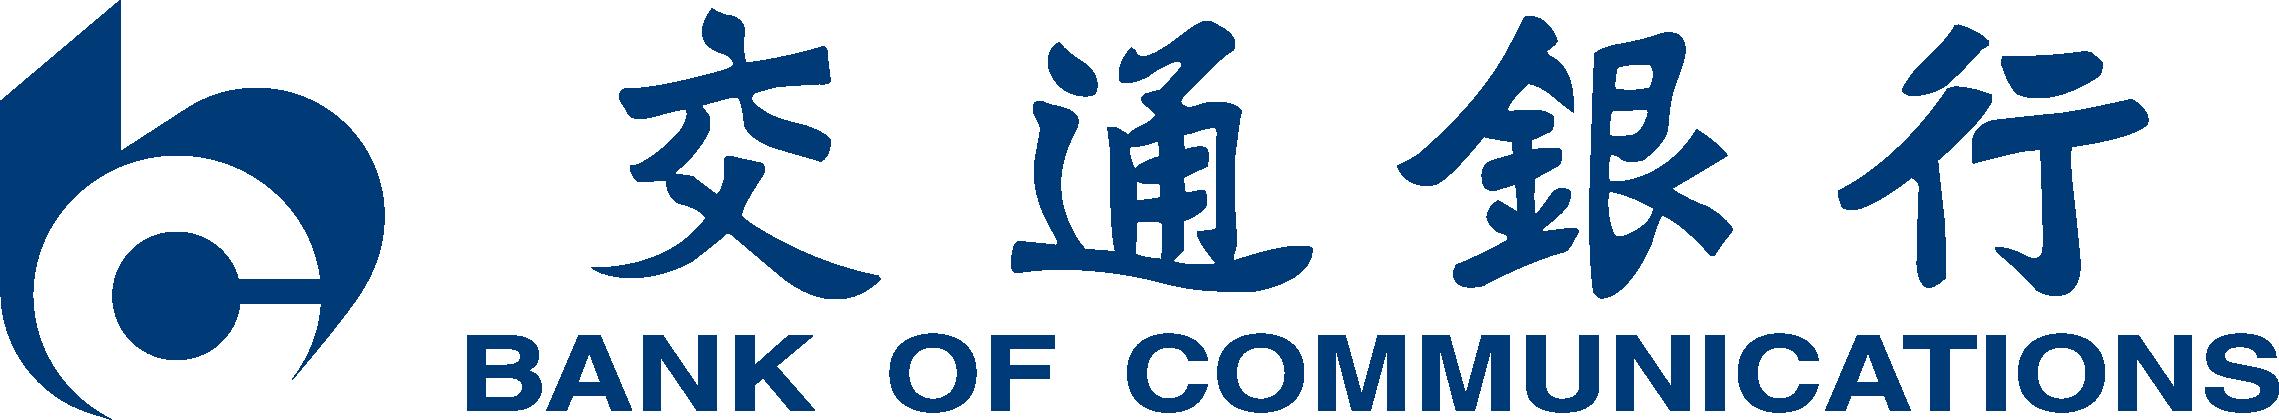 Bank of Communications Logo Background PNG Image